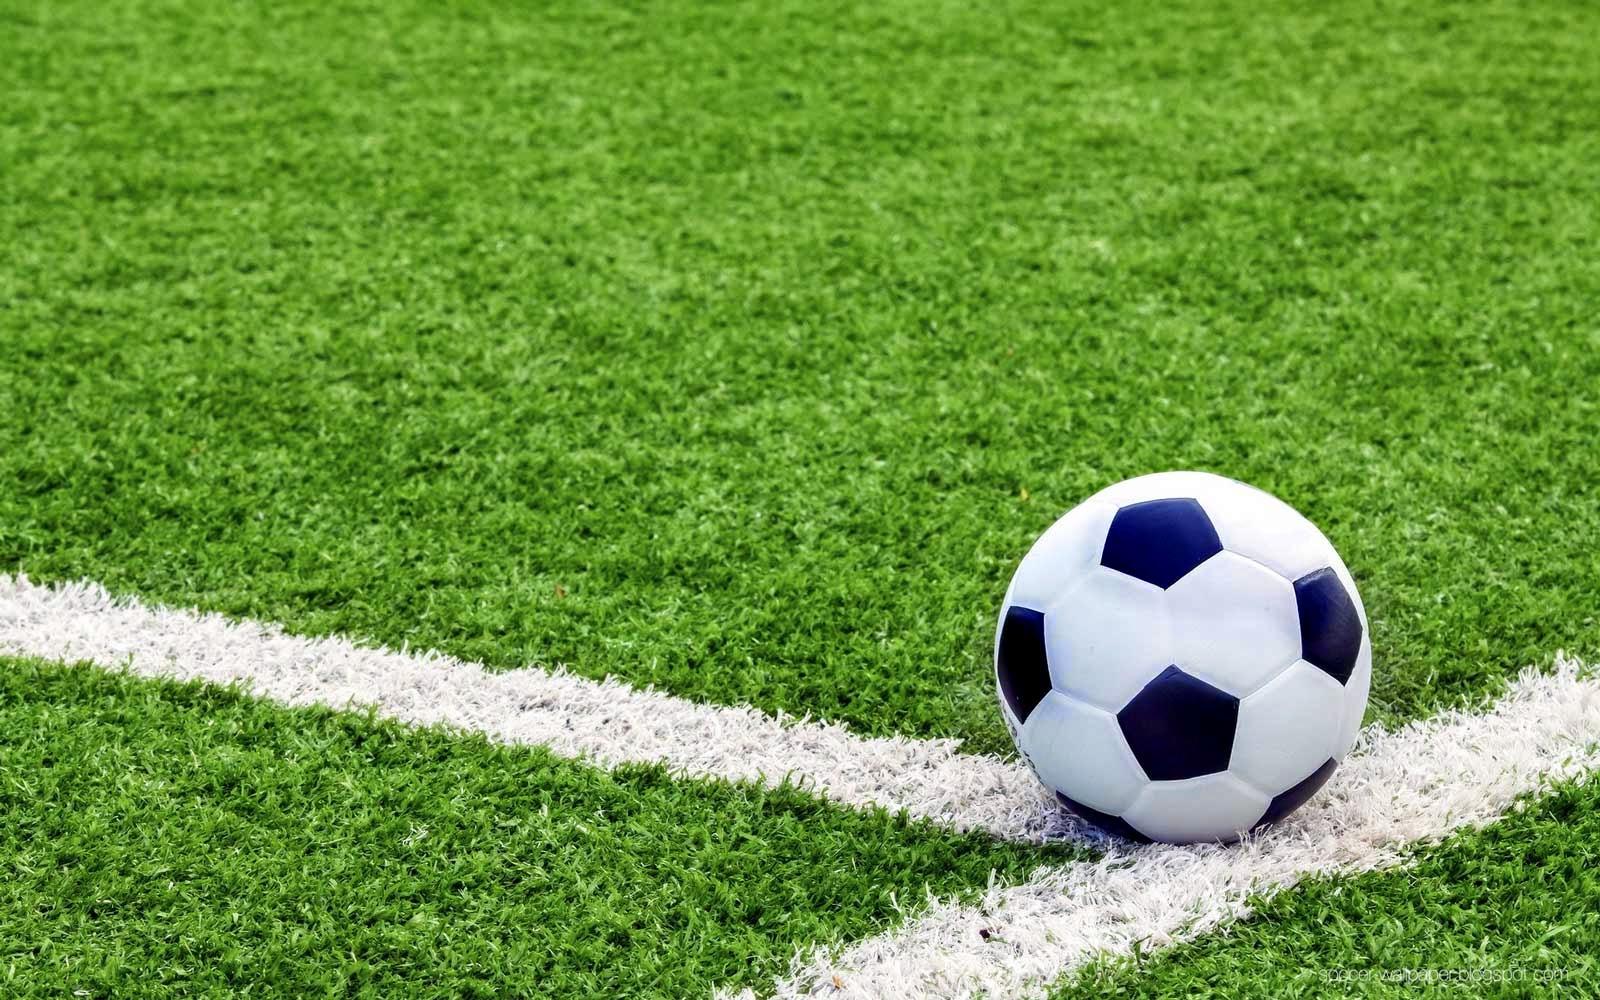 Best 30 Soccer FieldTop 30 Soccer FieldMost 30 Soccer Field 1600x1000